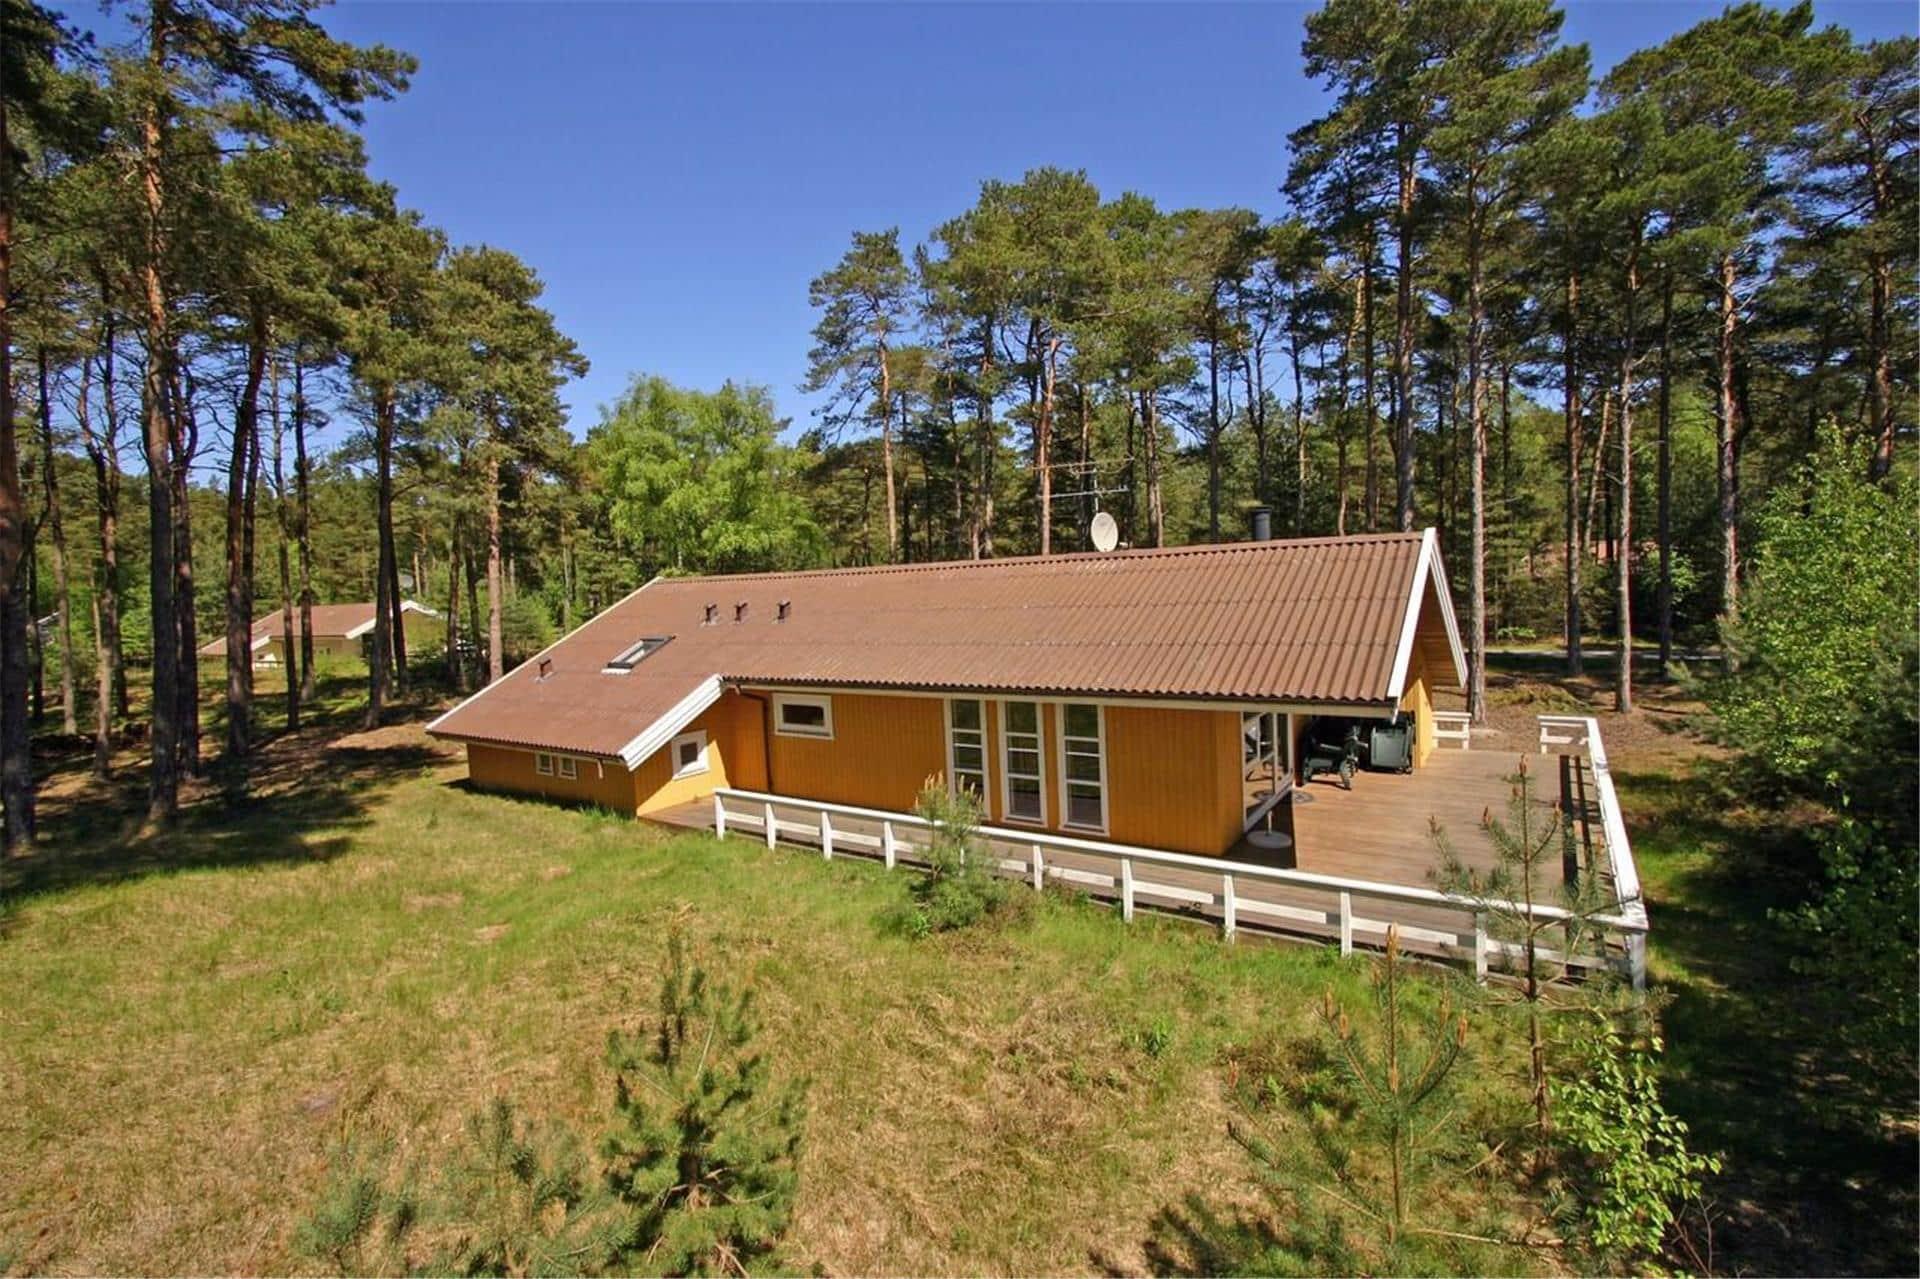 Billede 1-10 Sommerhus 2630, Møllestien 6, DK - 3730 Nexø